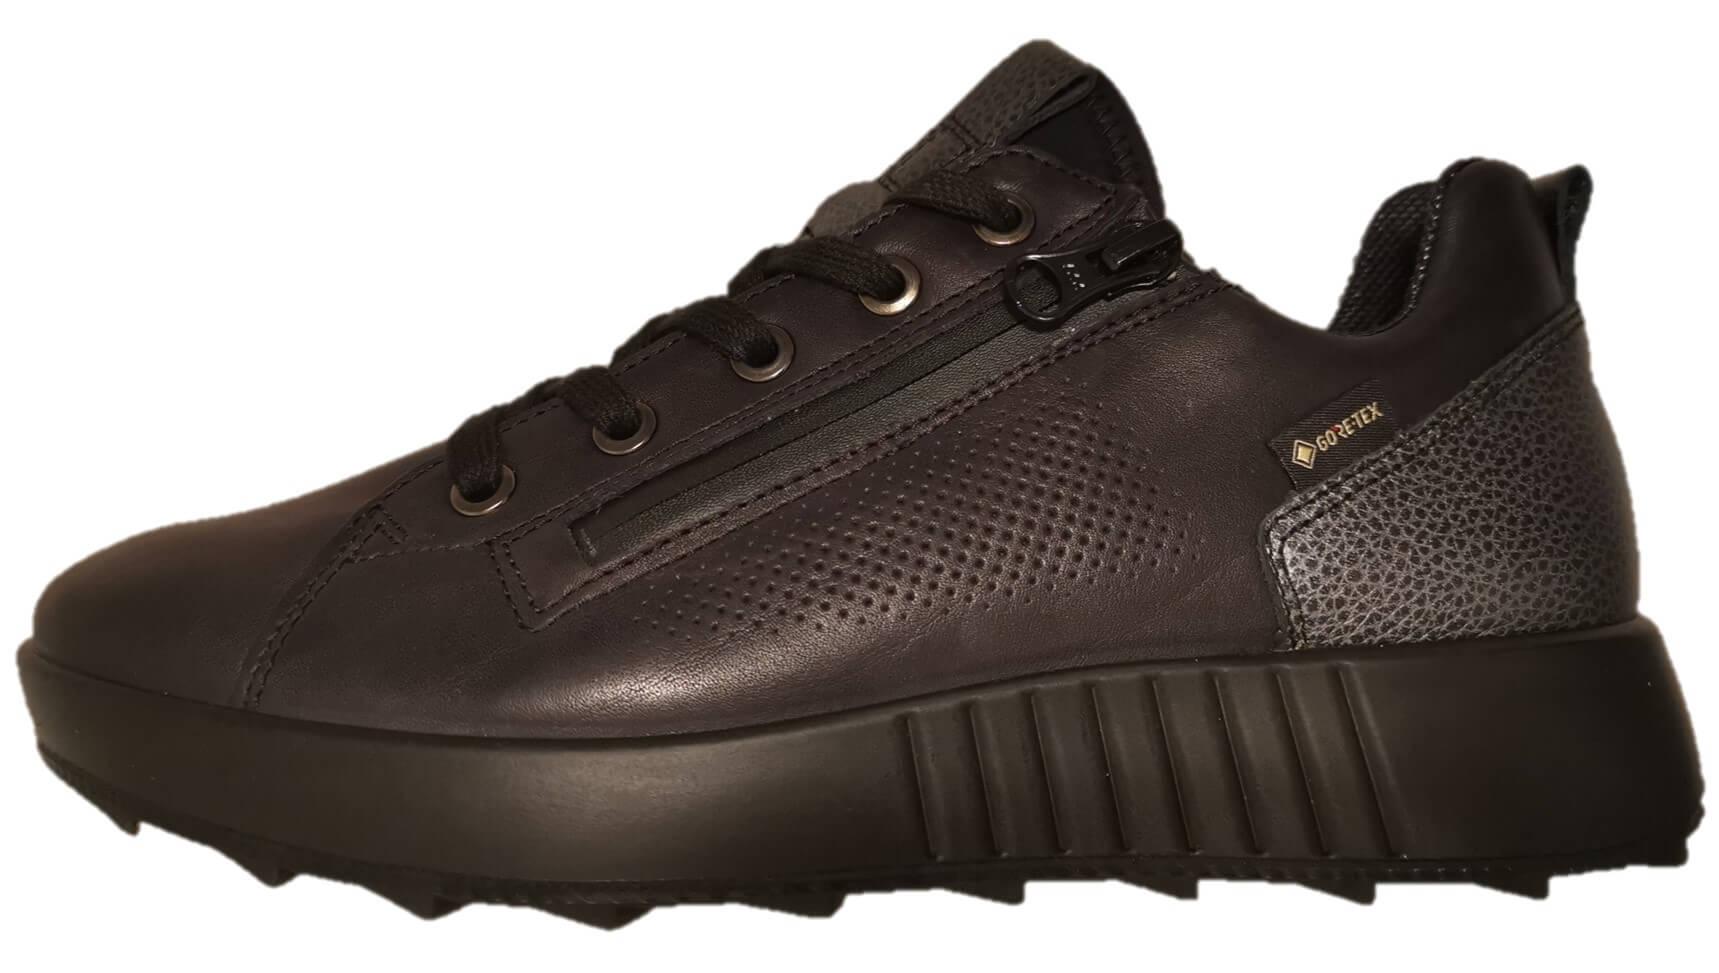 Black Gore-Tex shoes